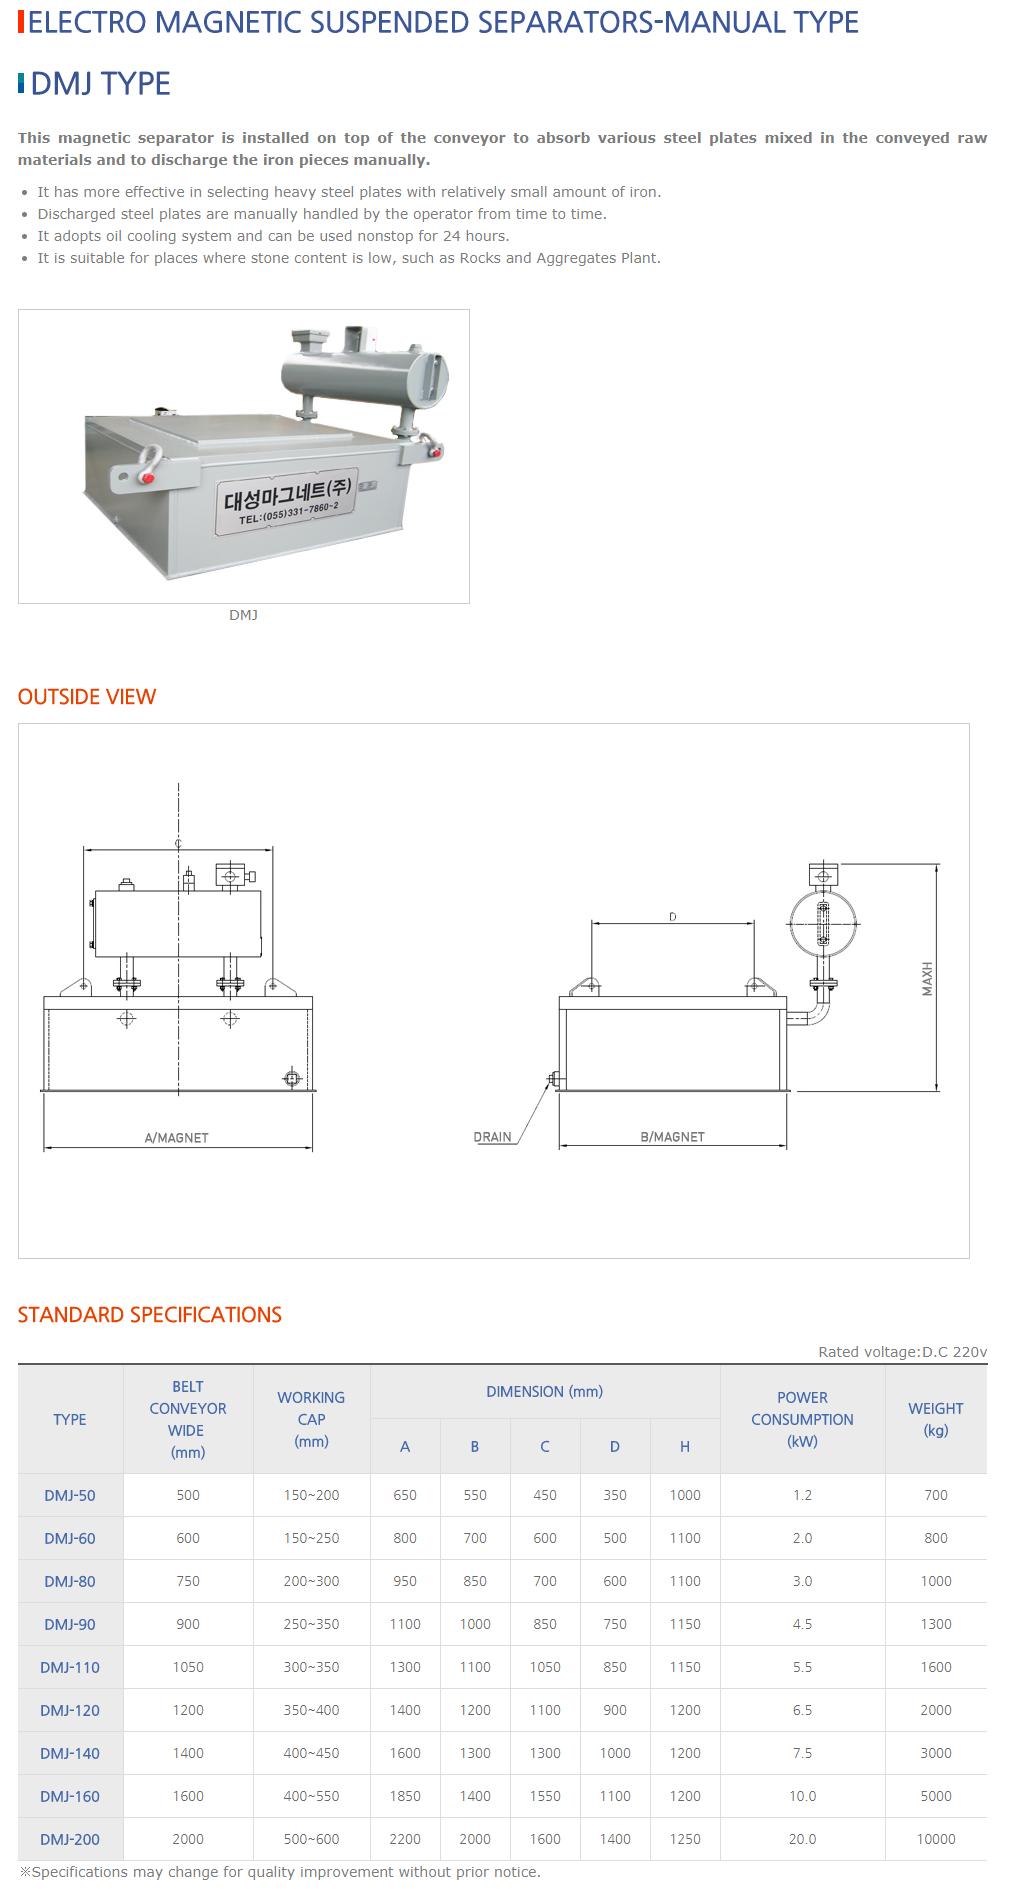 DAESUNG MARGNET Electro Magnetic Suspended Separators (Manual Type) DMJ Type